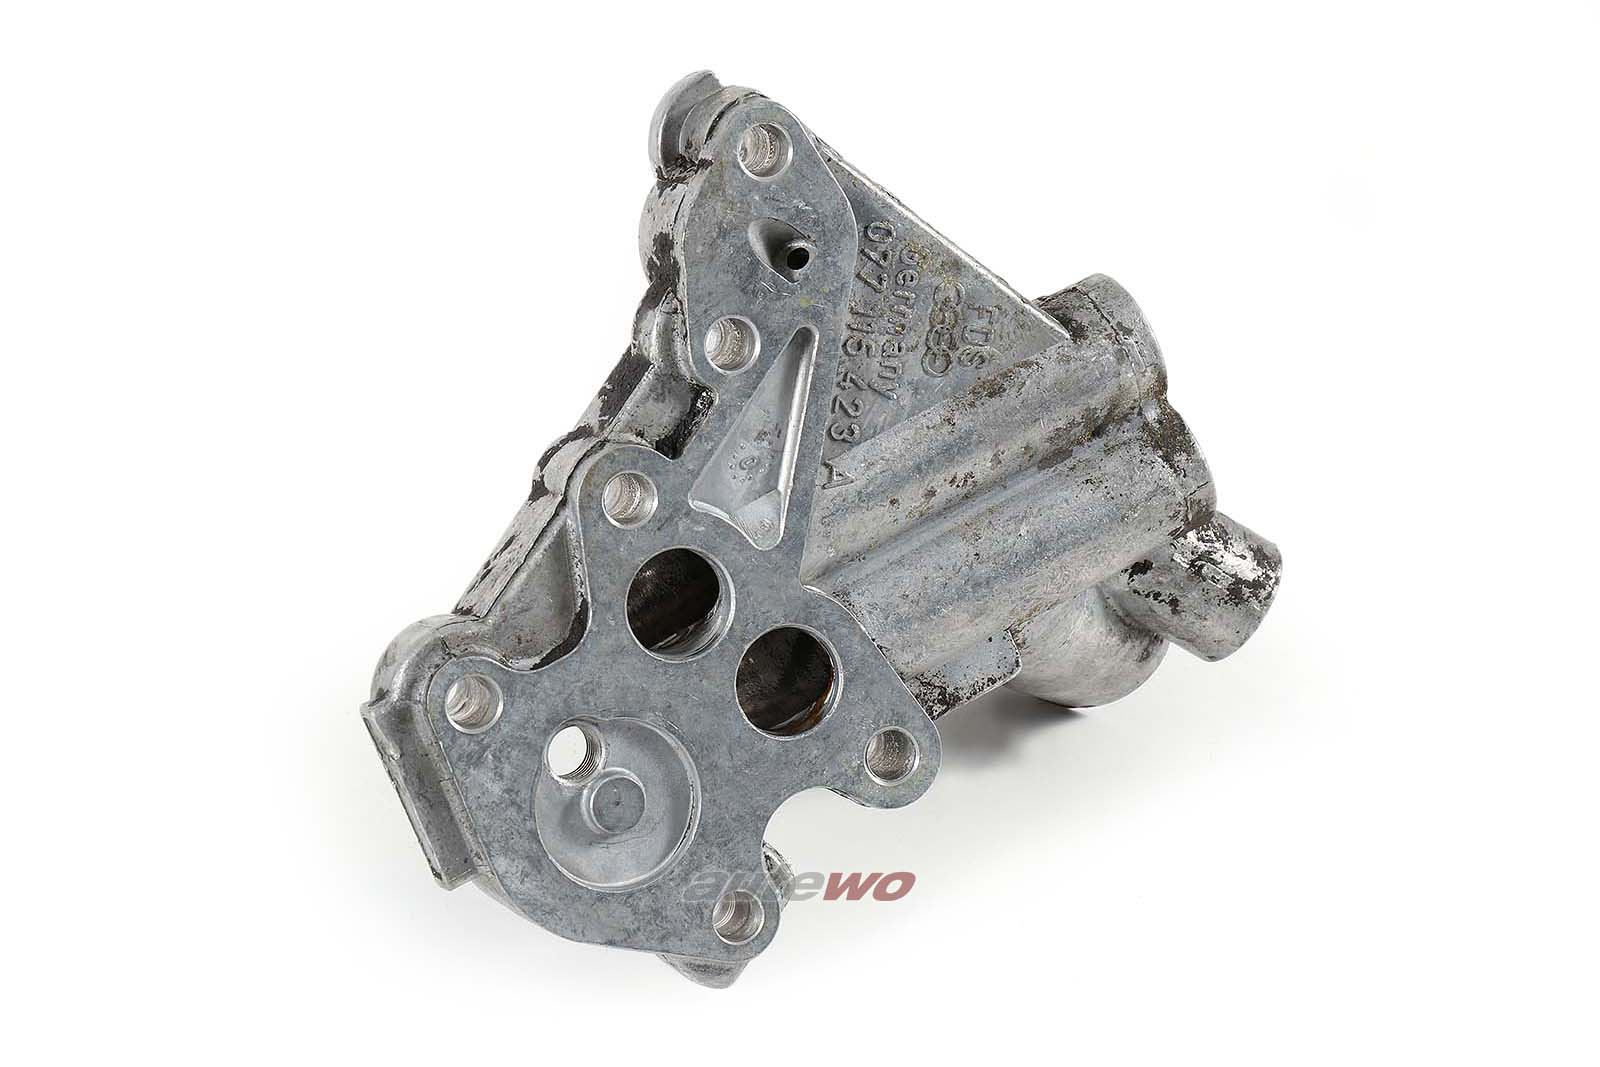 077115423A 077115422A Audi V8 D11/S4&S6/S6+ C4 Verschlussdeckel Ölkühler